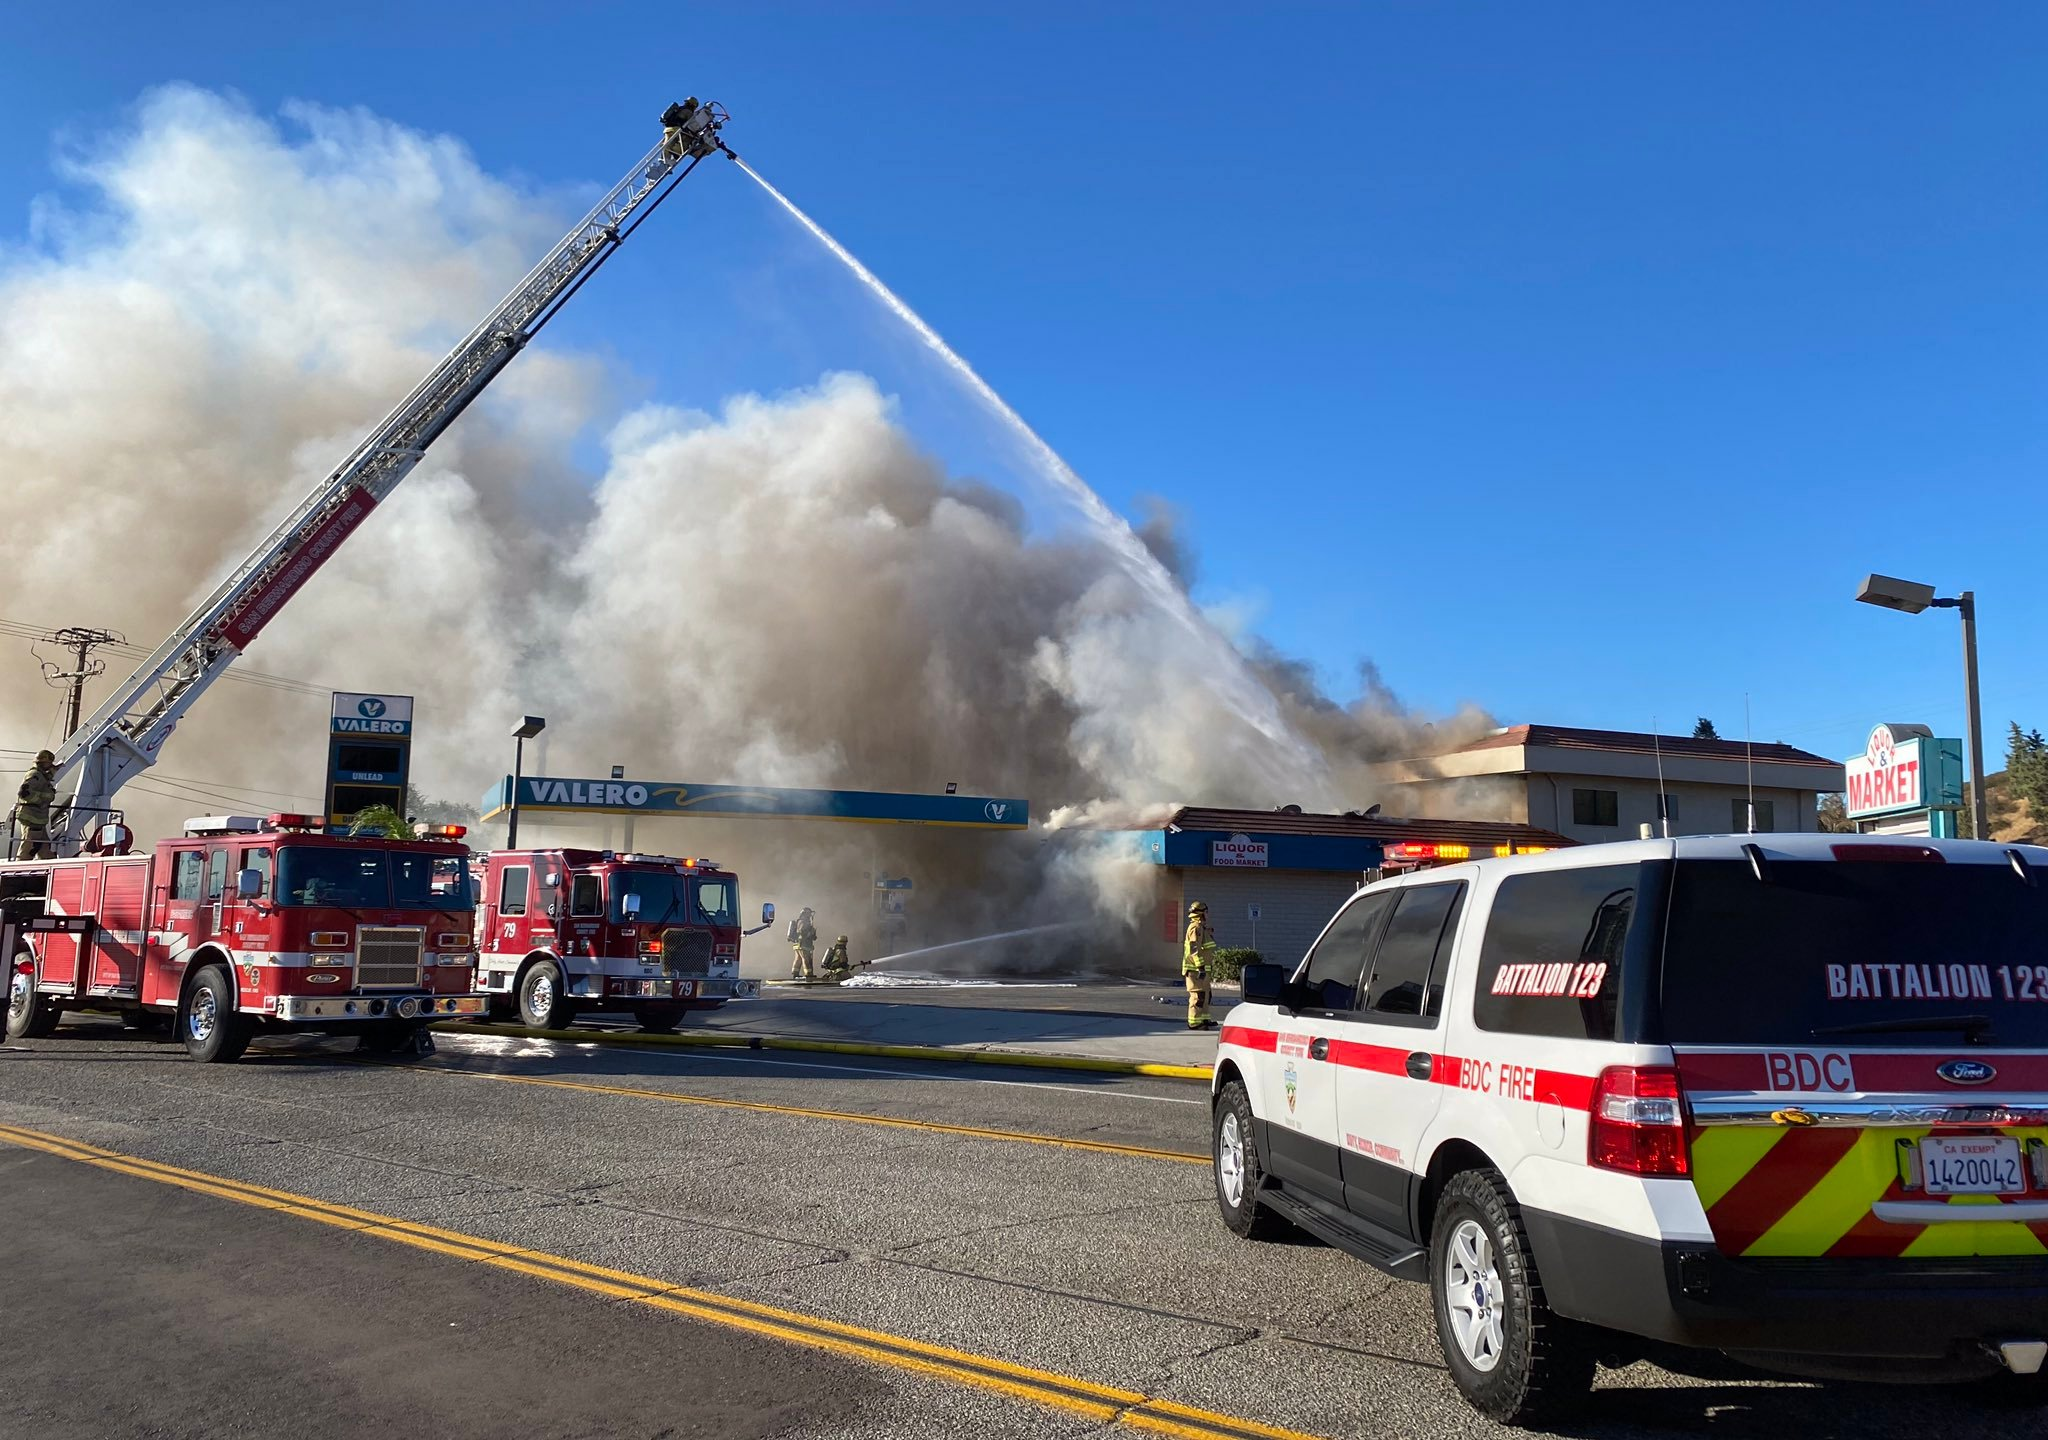 A fire broke out at a Fontana gas station on Oct. 30, 2020. (San Bernardino County Fire Department)